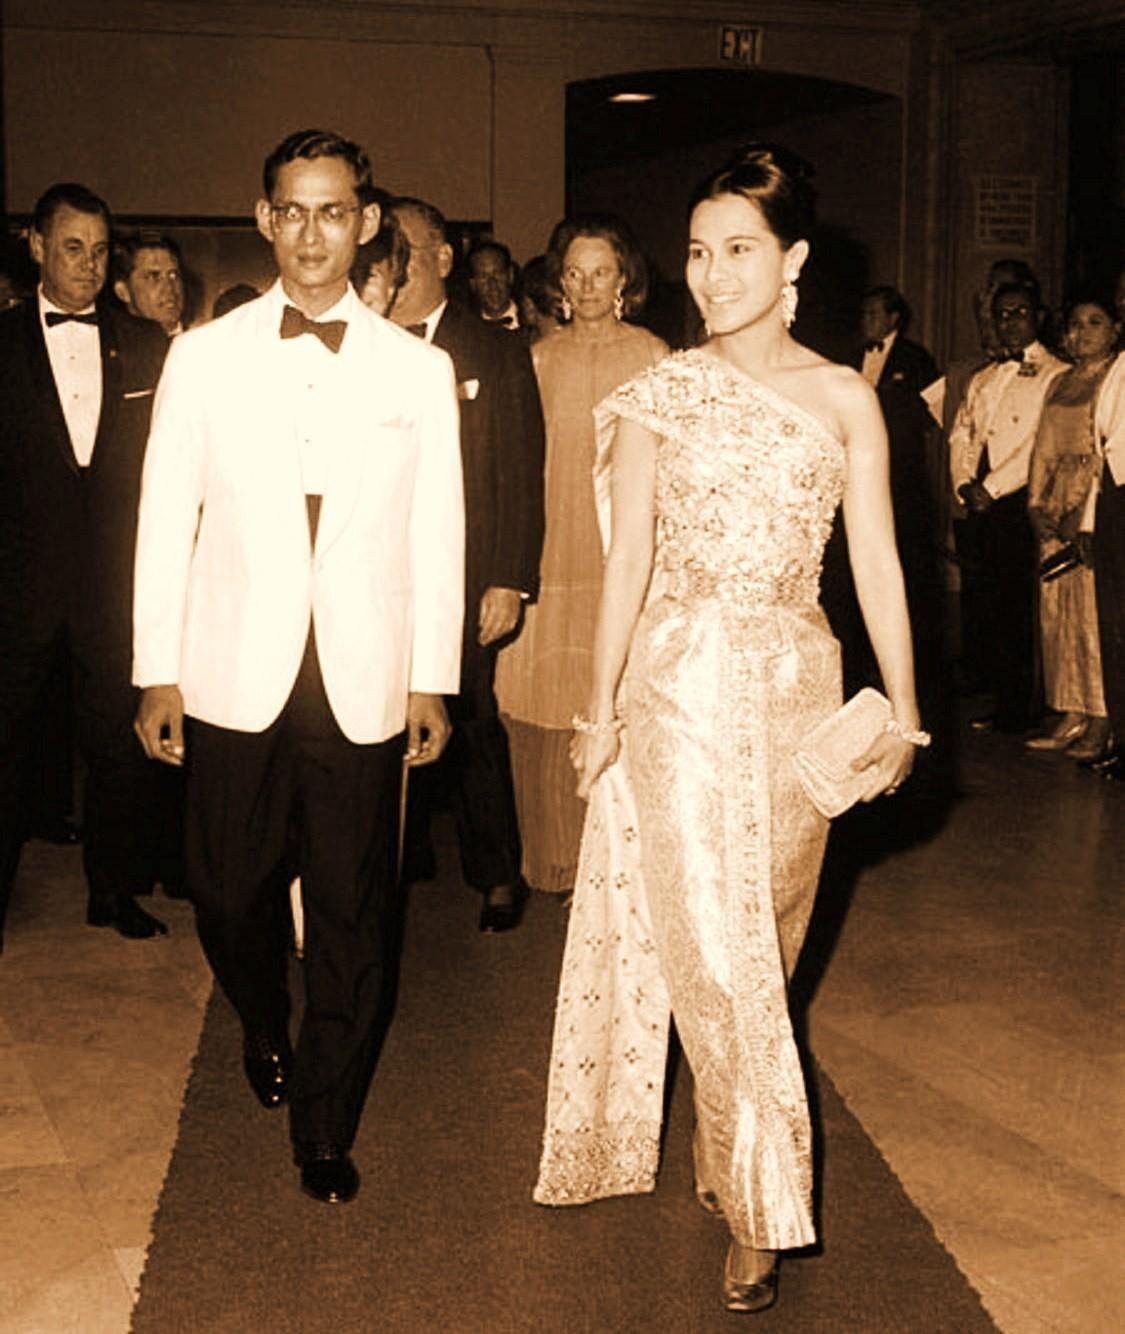 King & Queen of Siam